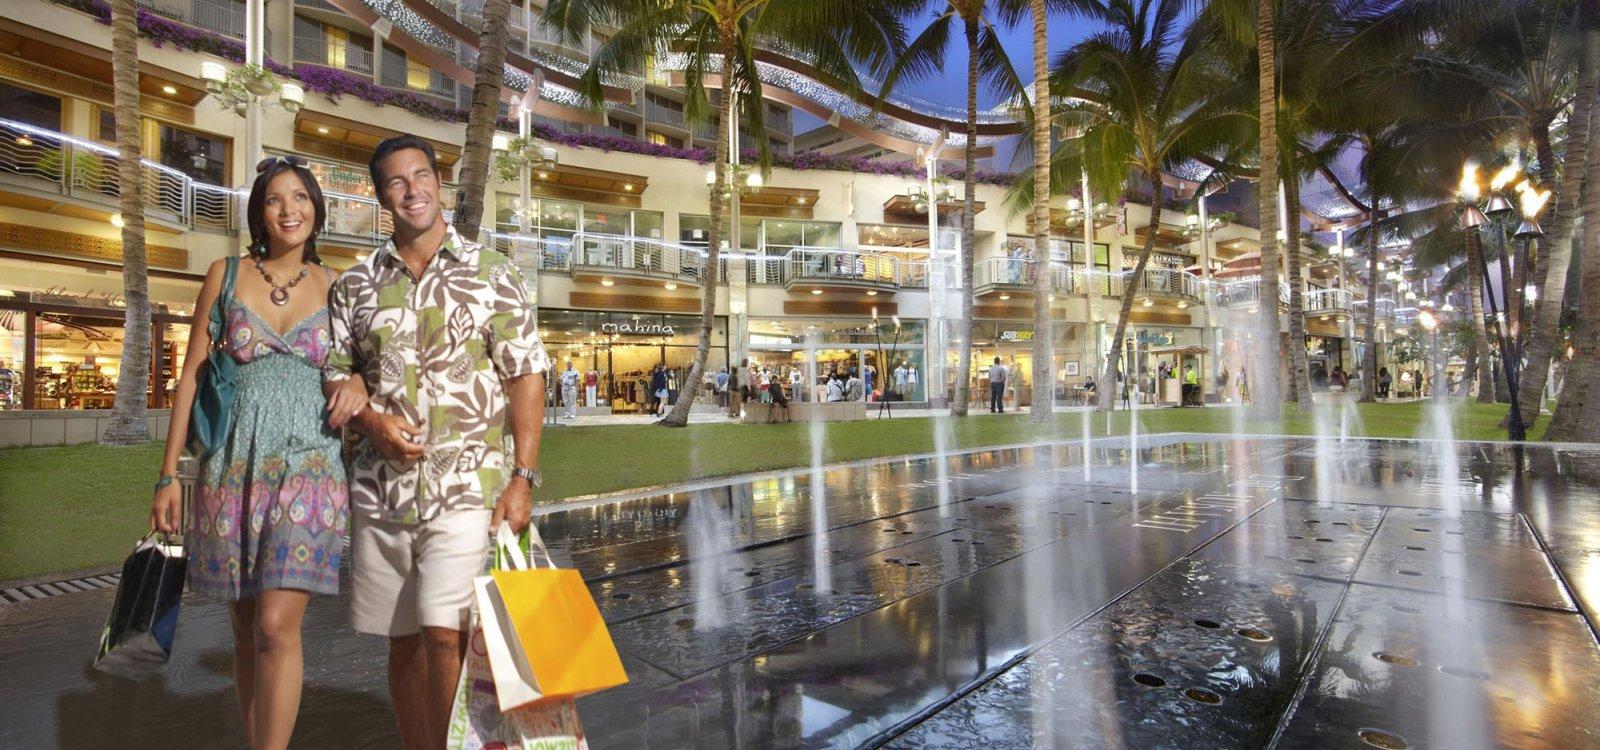 Honolulu travel | USA - Lonely Planet